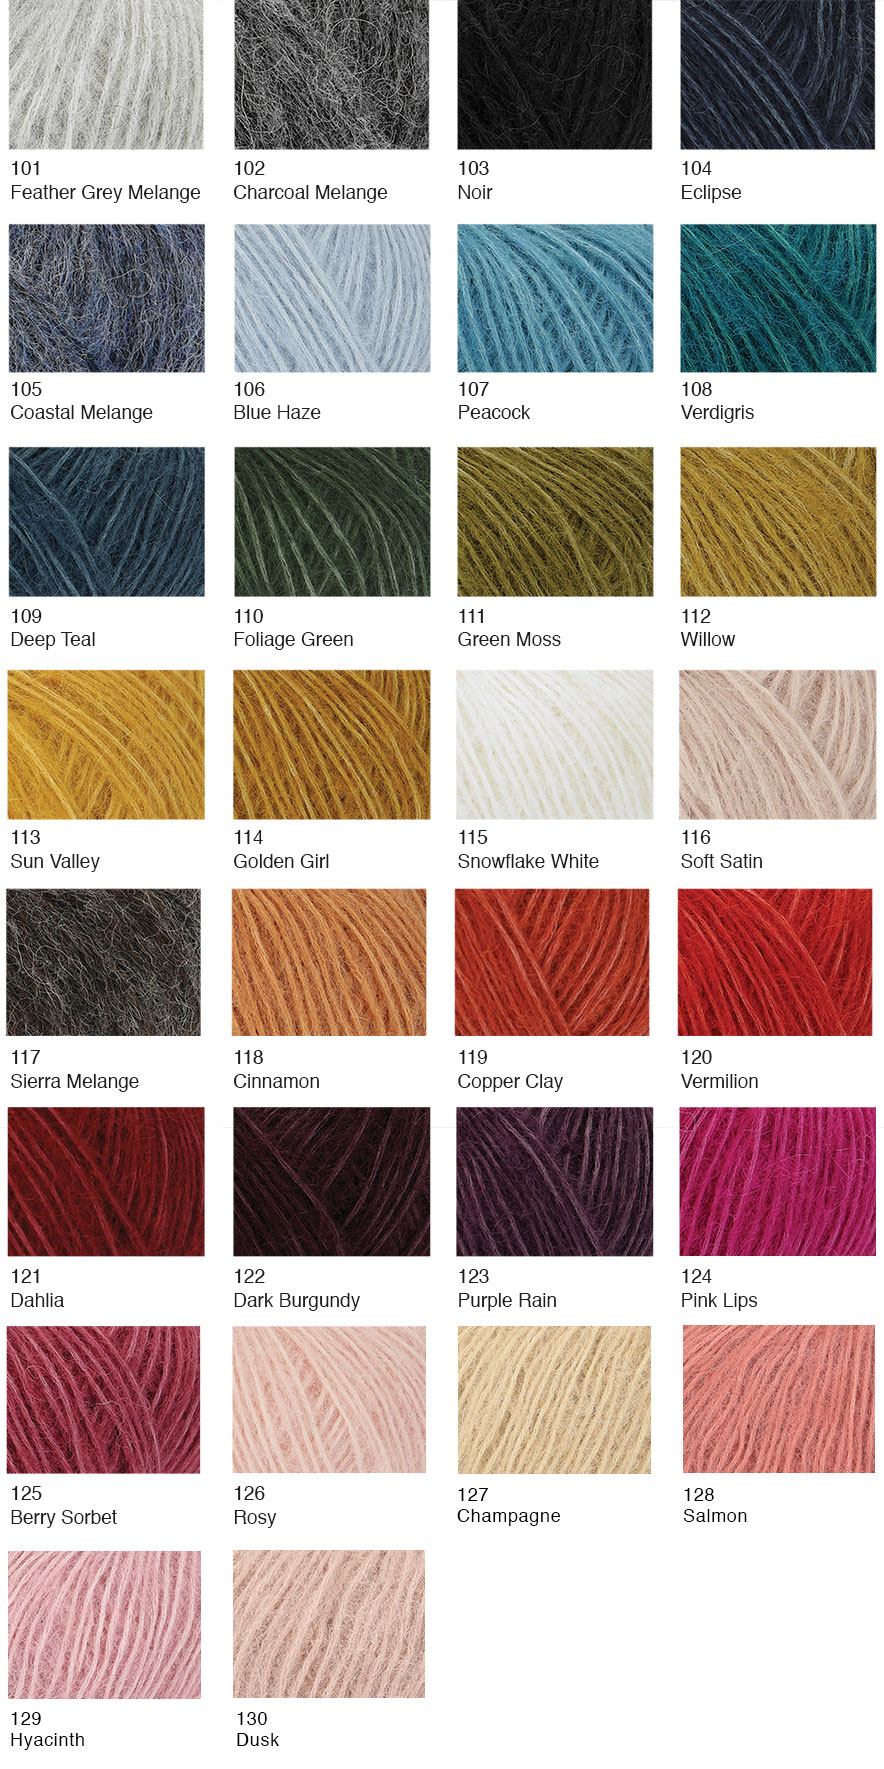 Rowan Alpaca classic yarn line de Afstap shadecard